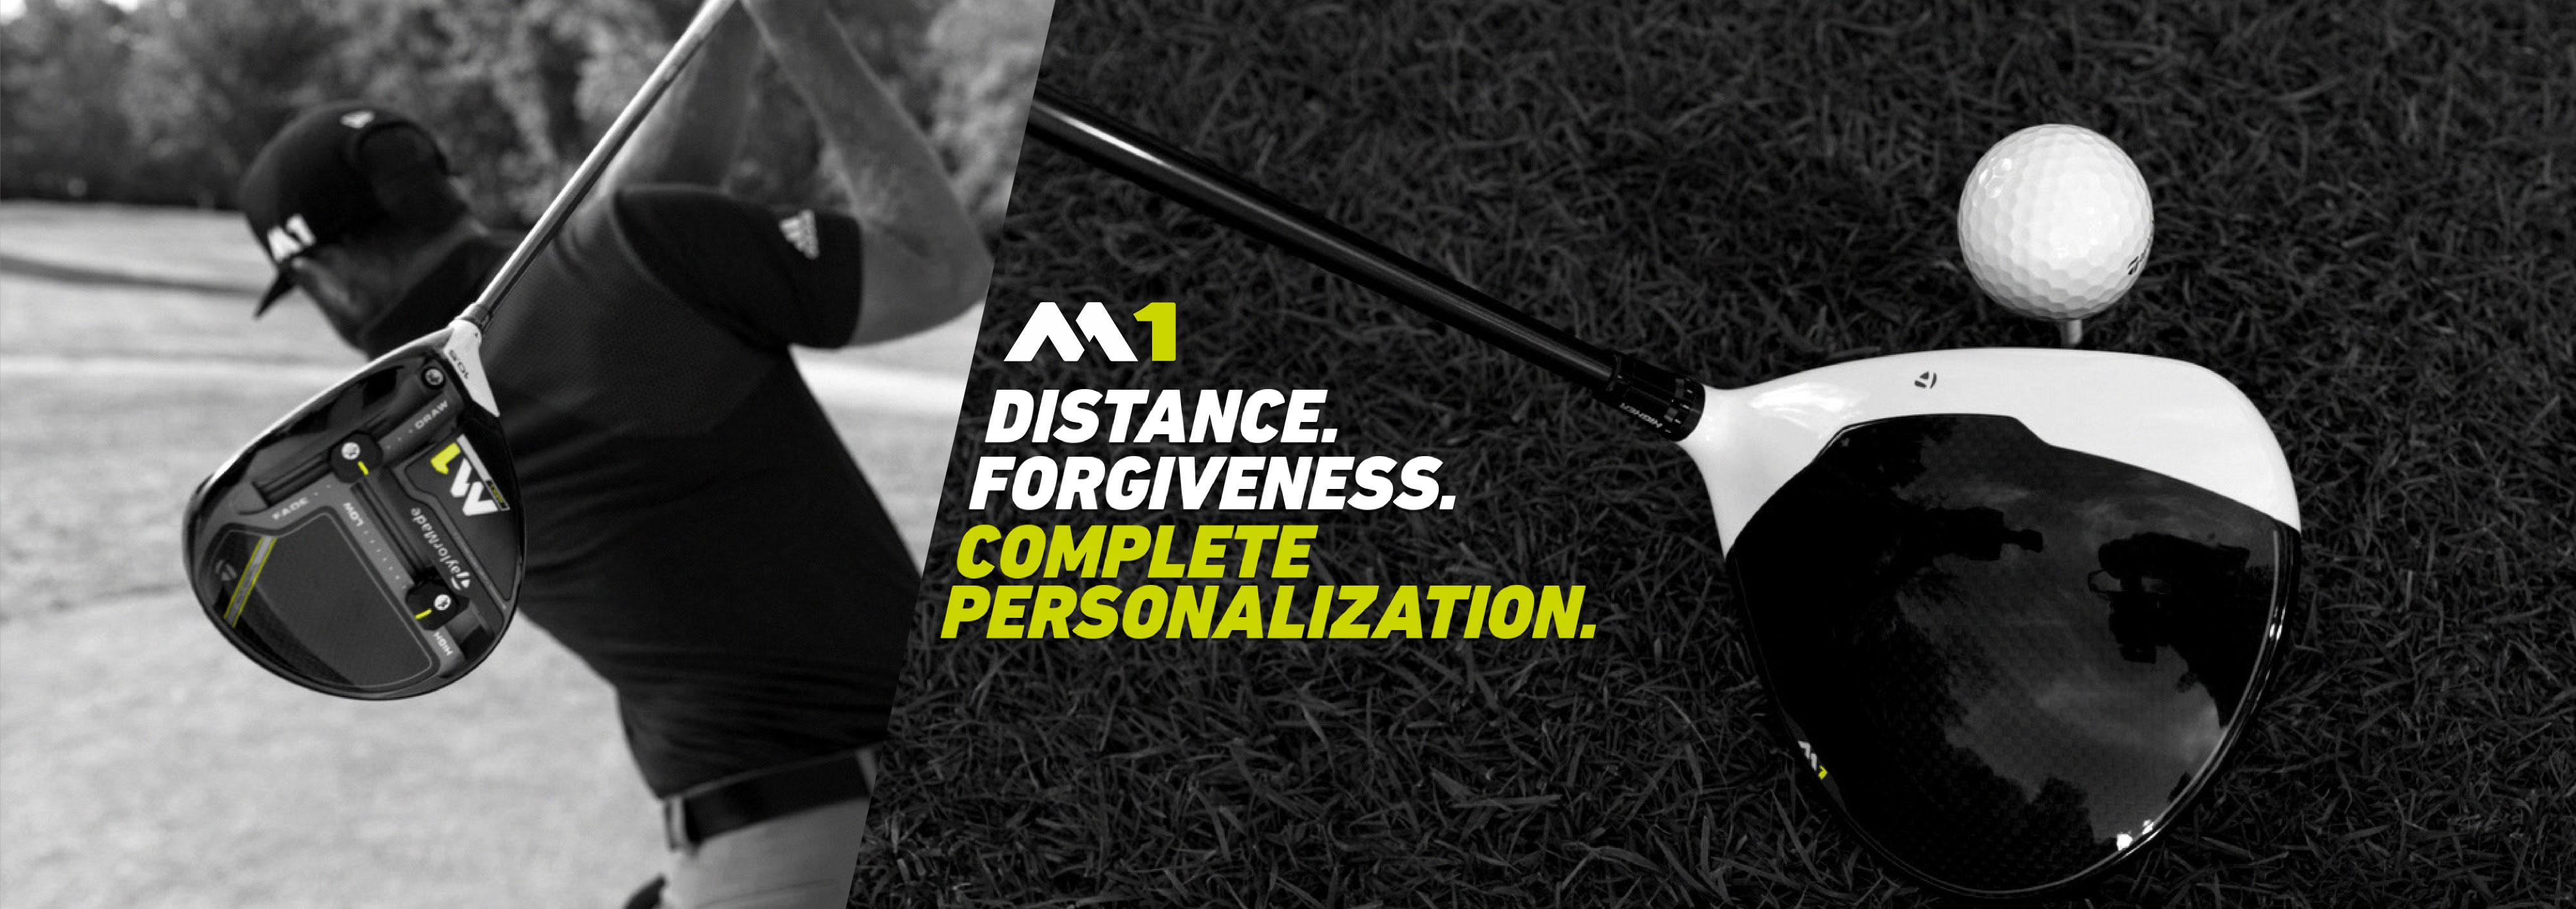 Distance. forgiveness. Complete personalization